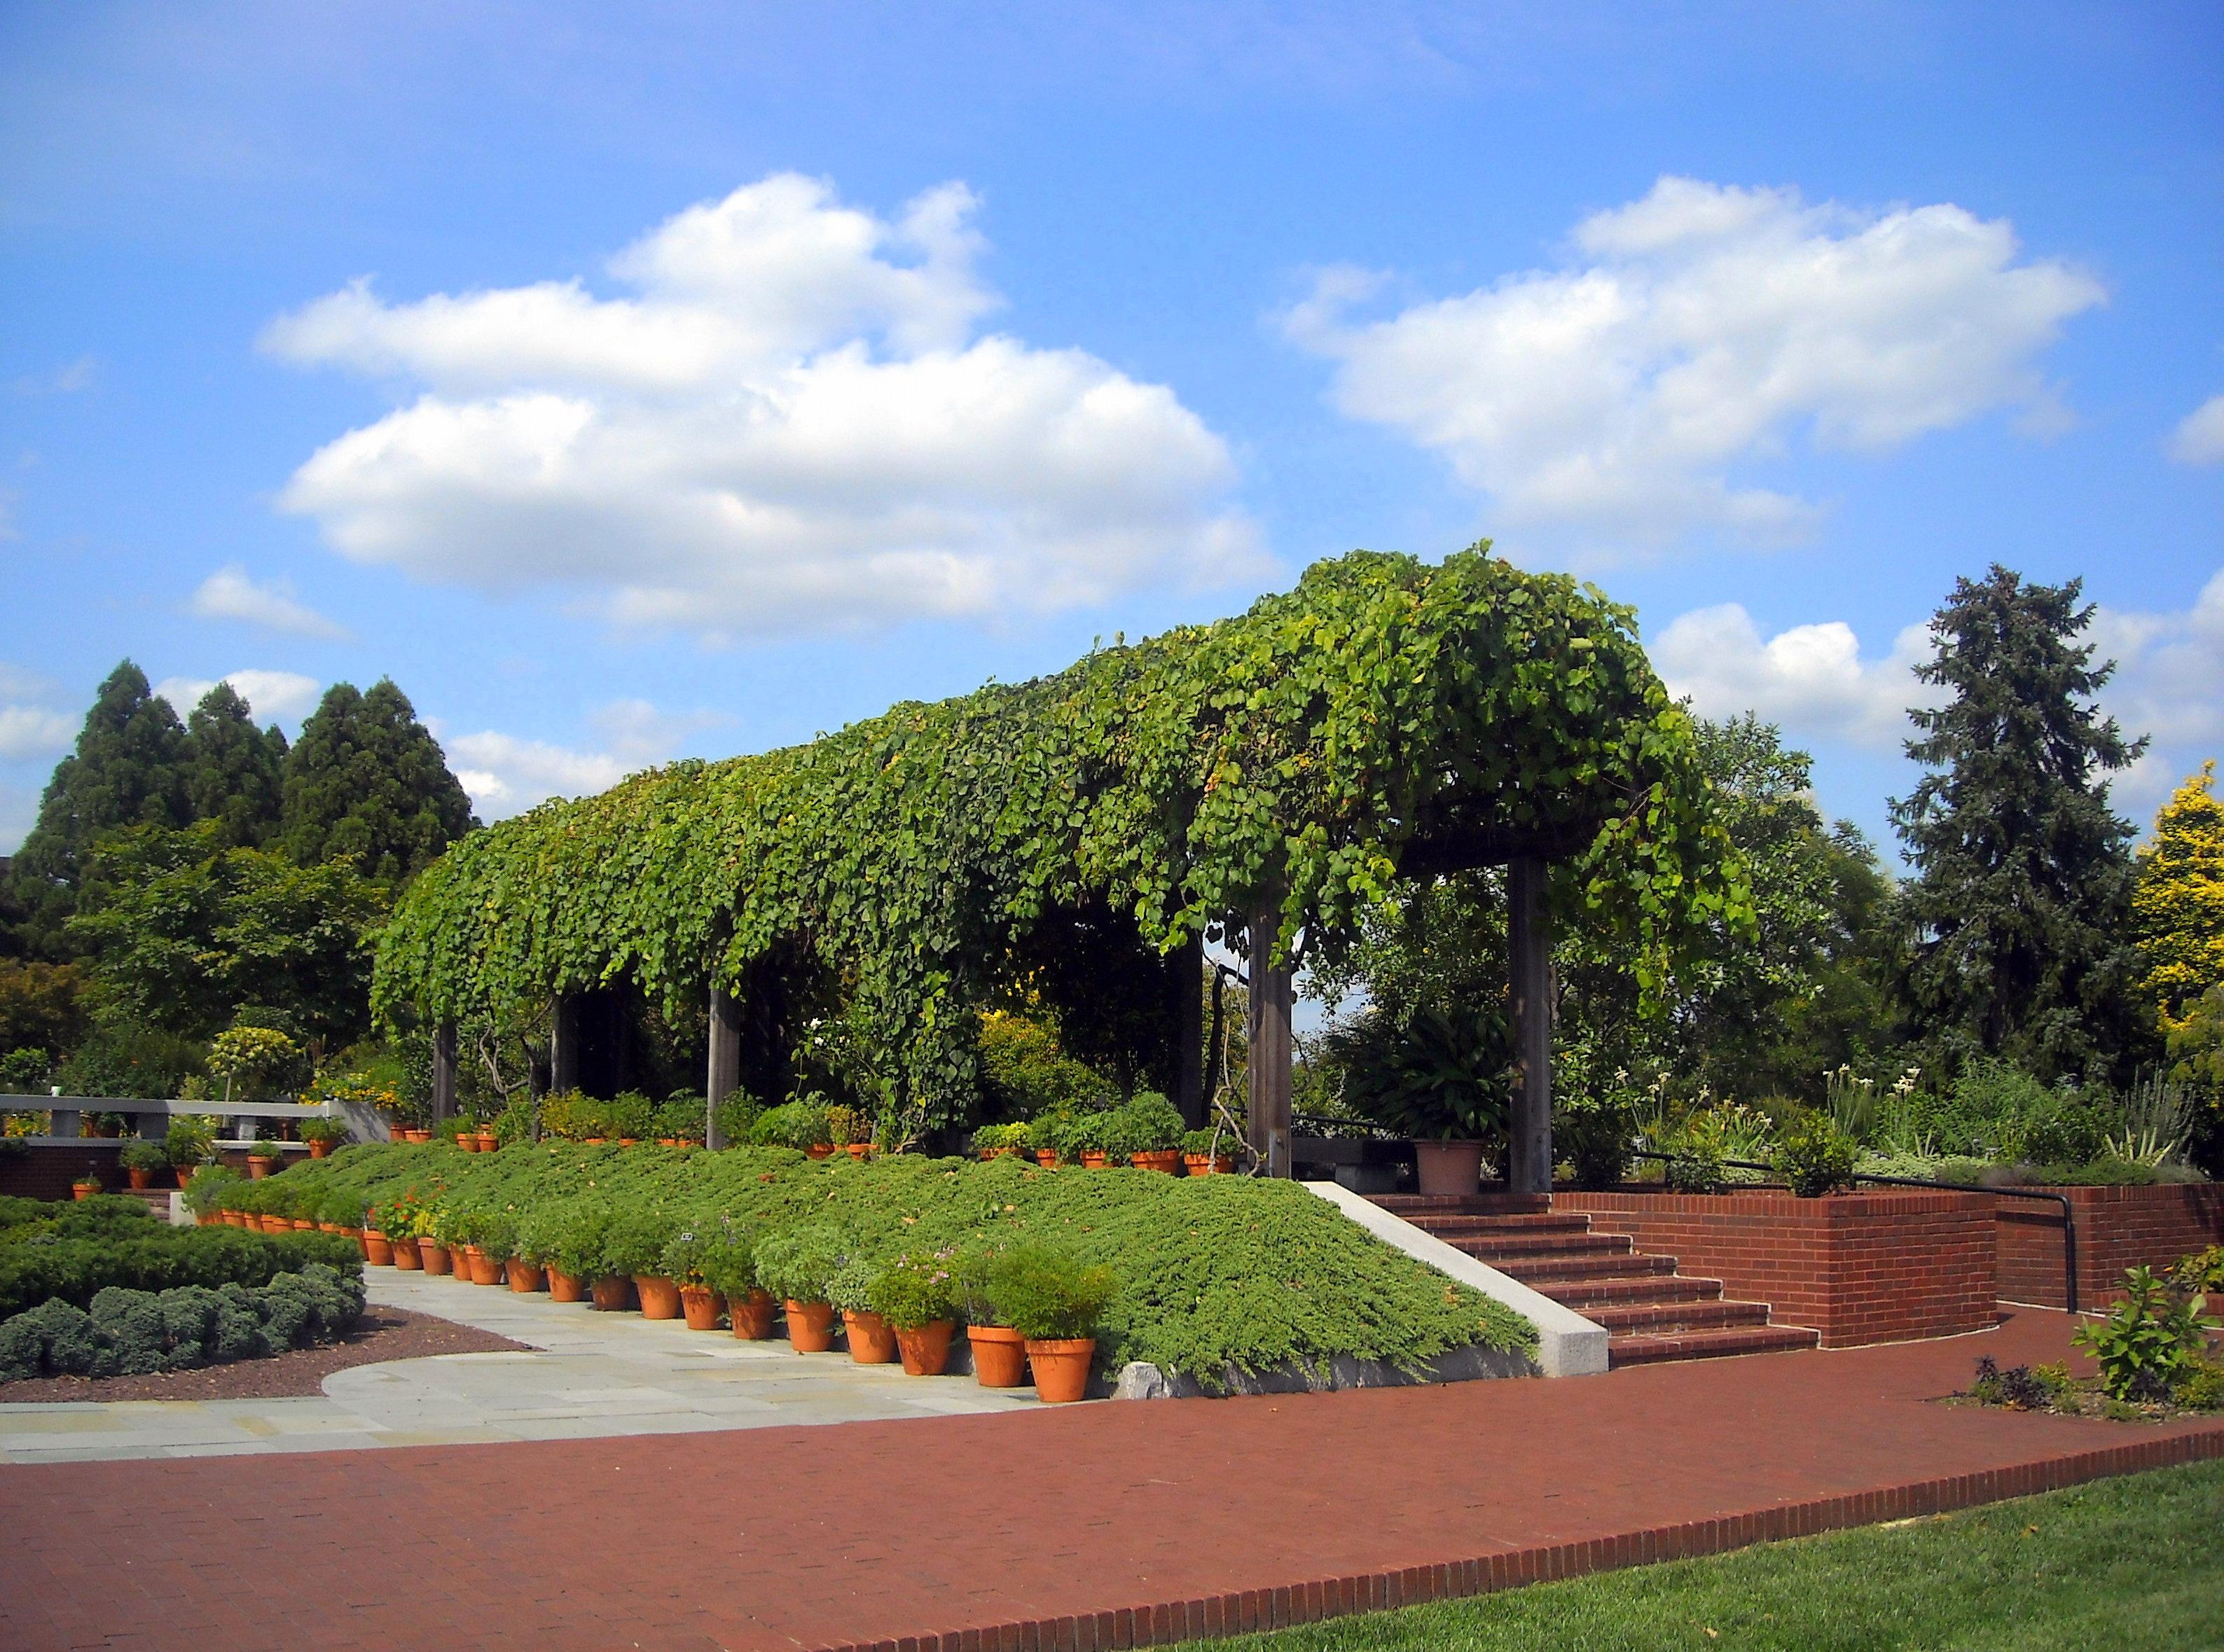 FileUnited States National Arboretum Garden